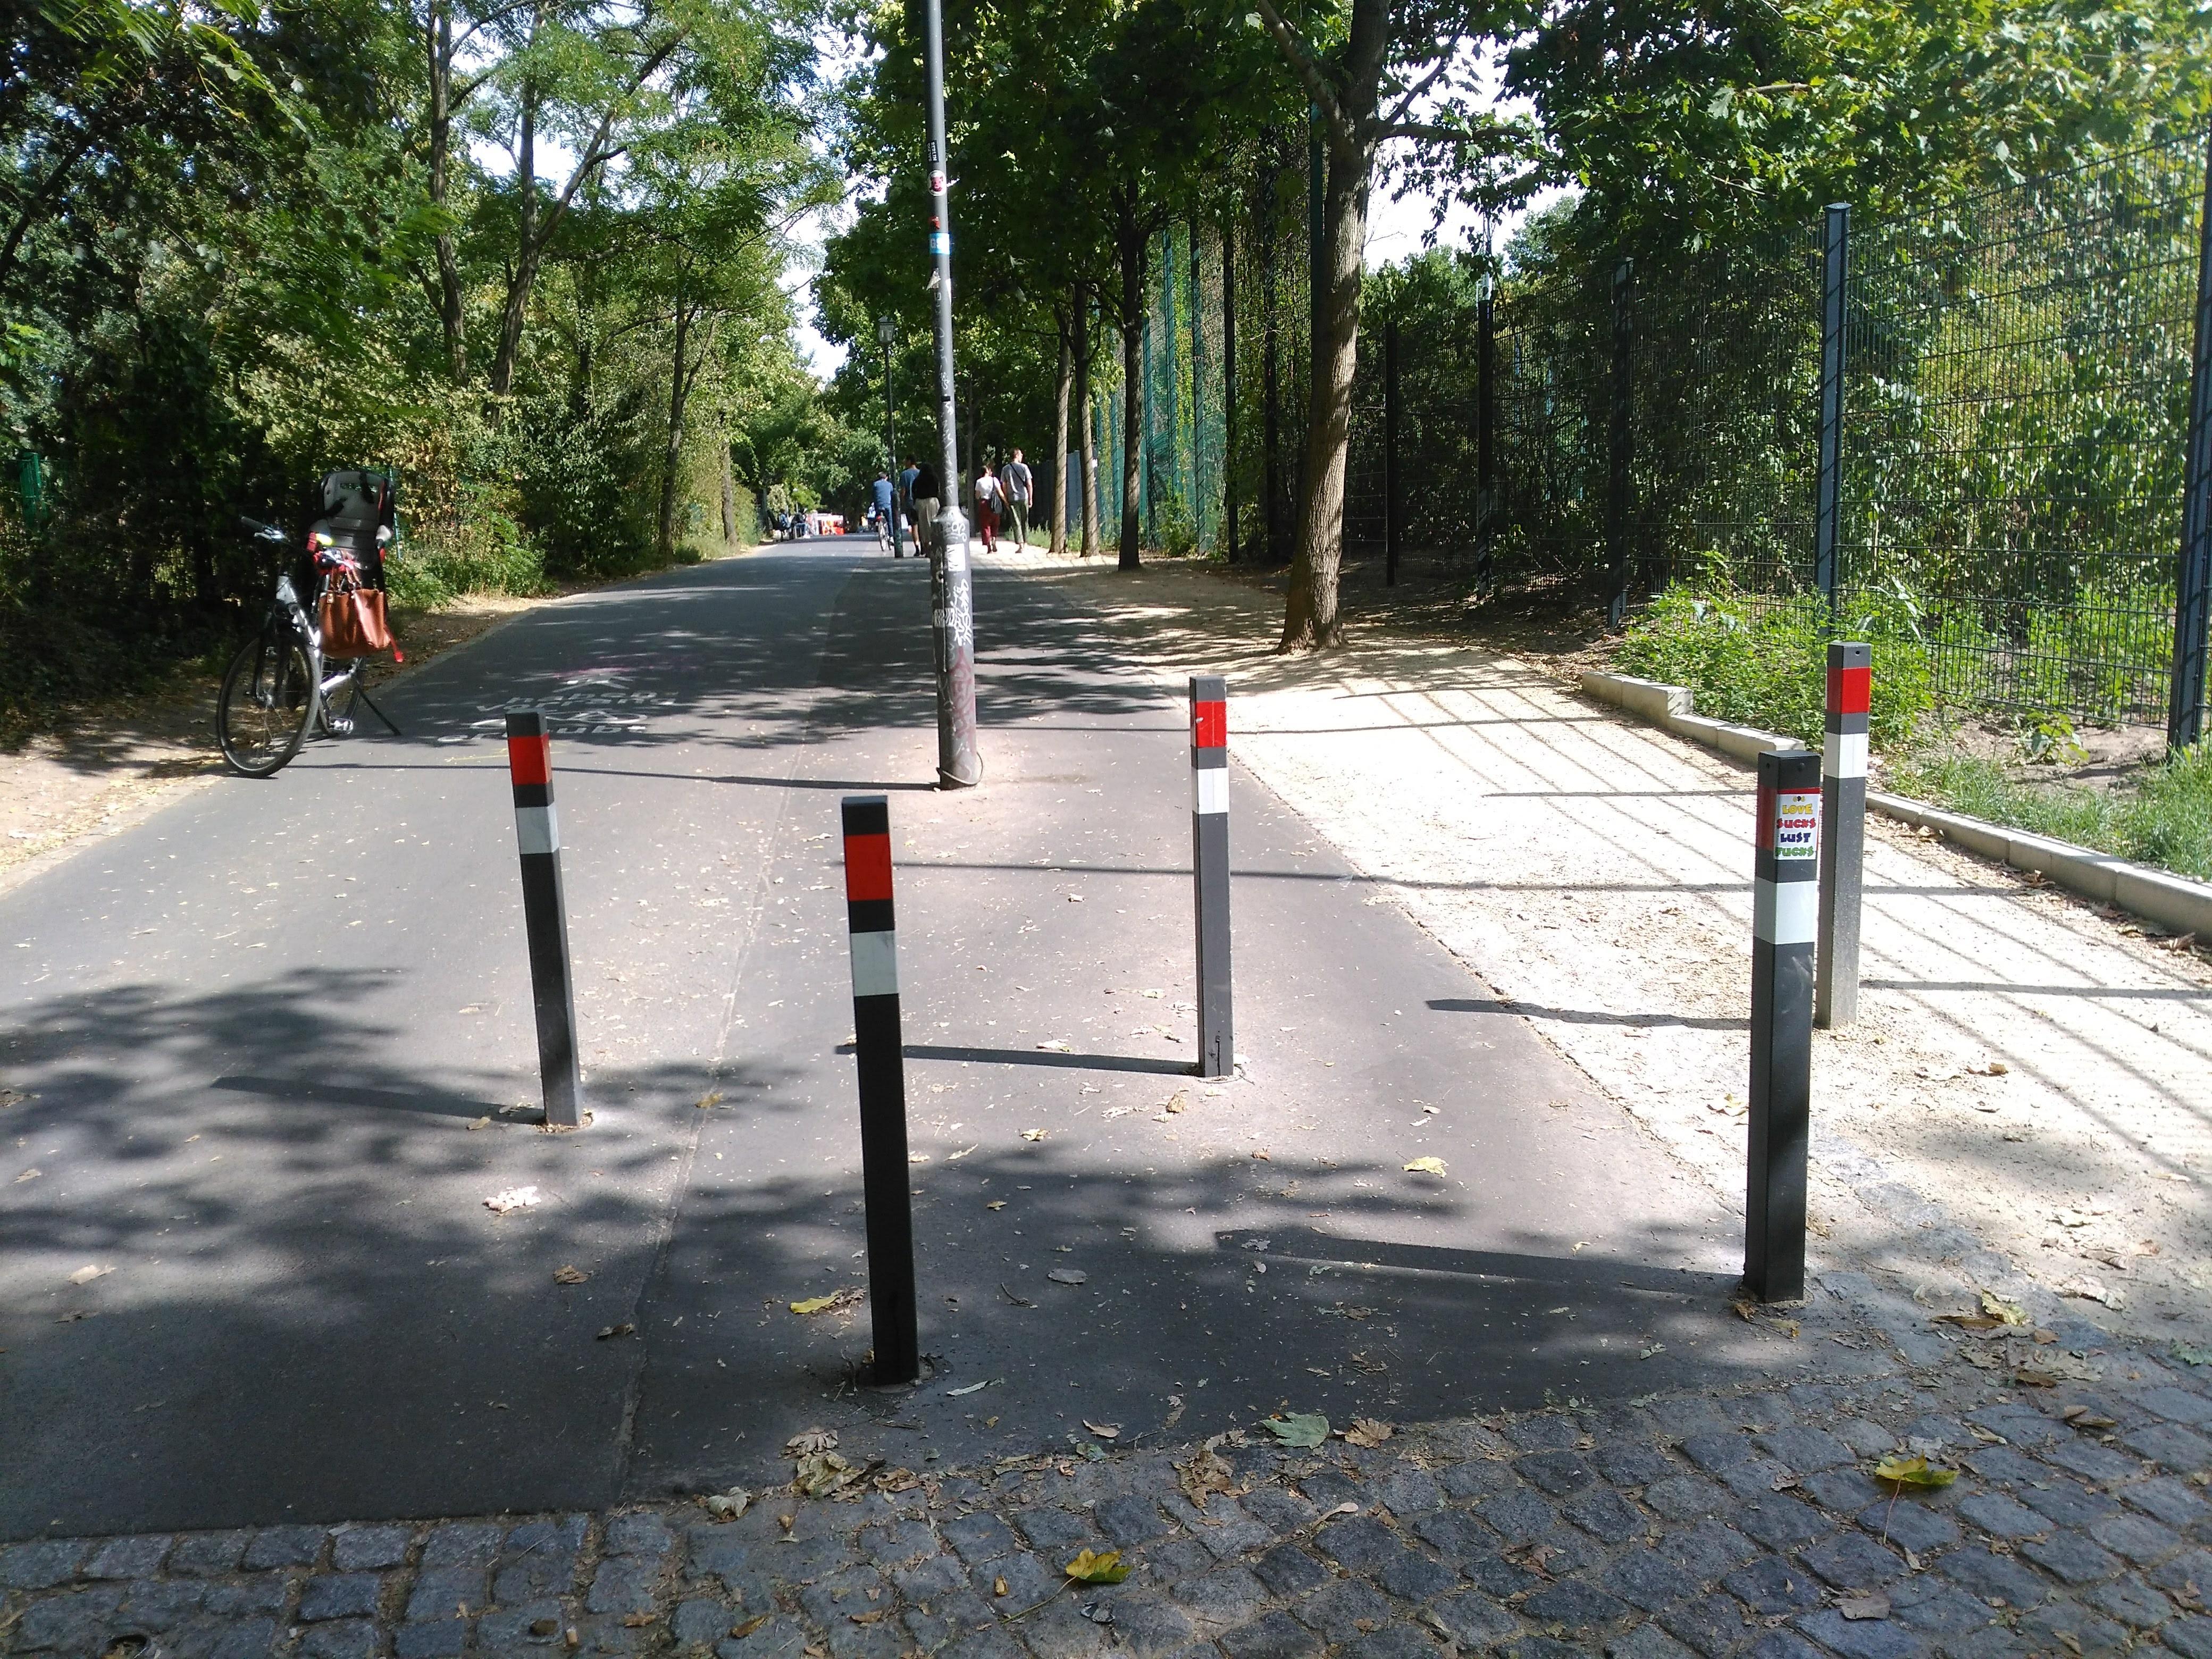 Verkehrssicherheit im Görlitzer Park verbessert